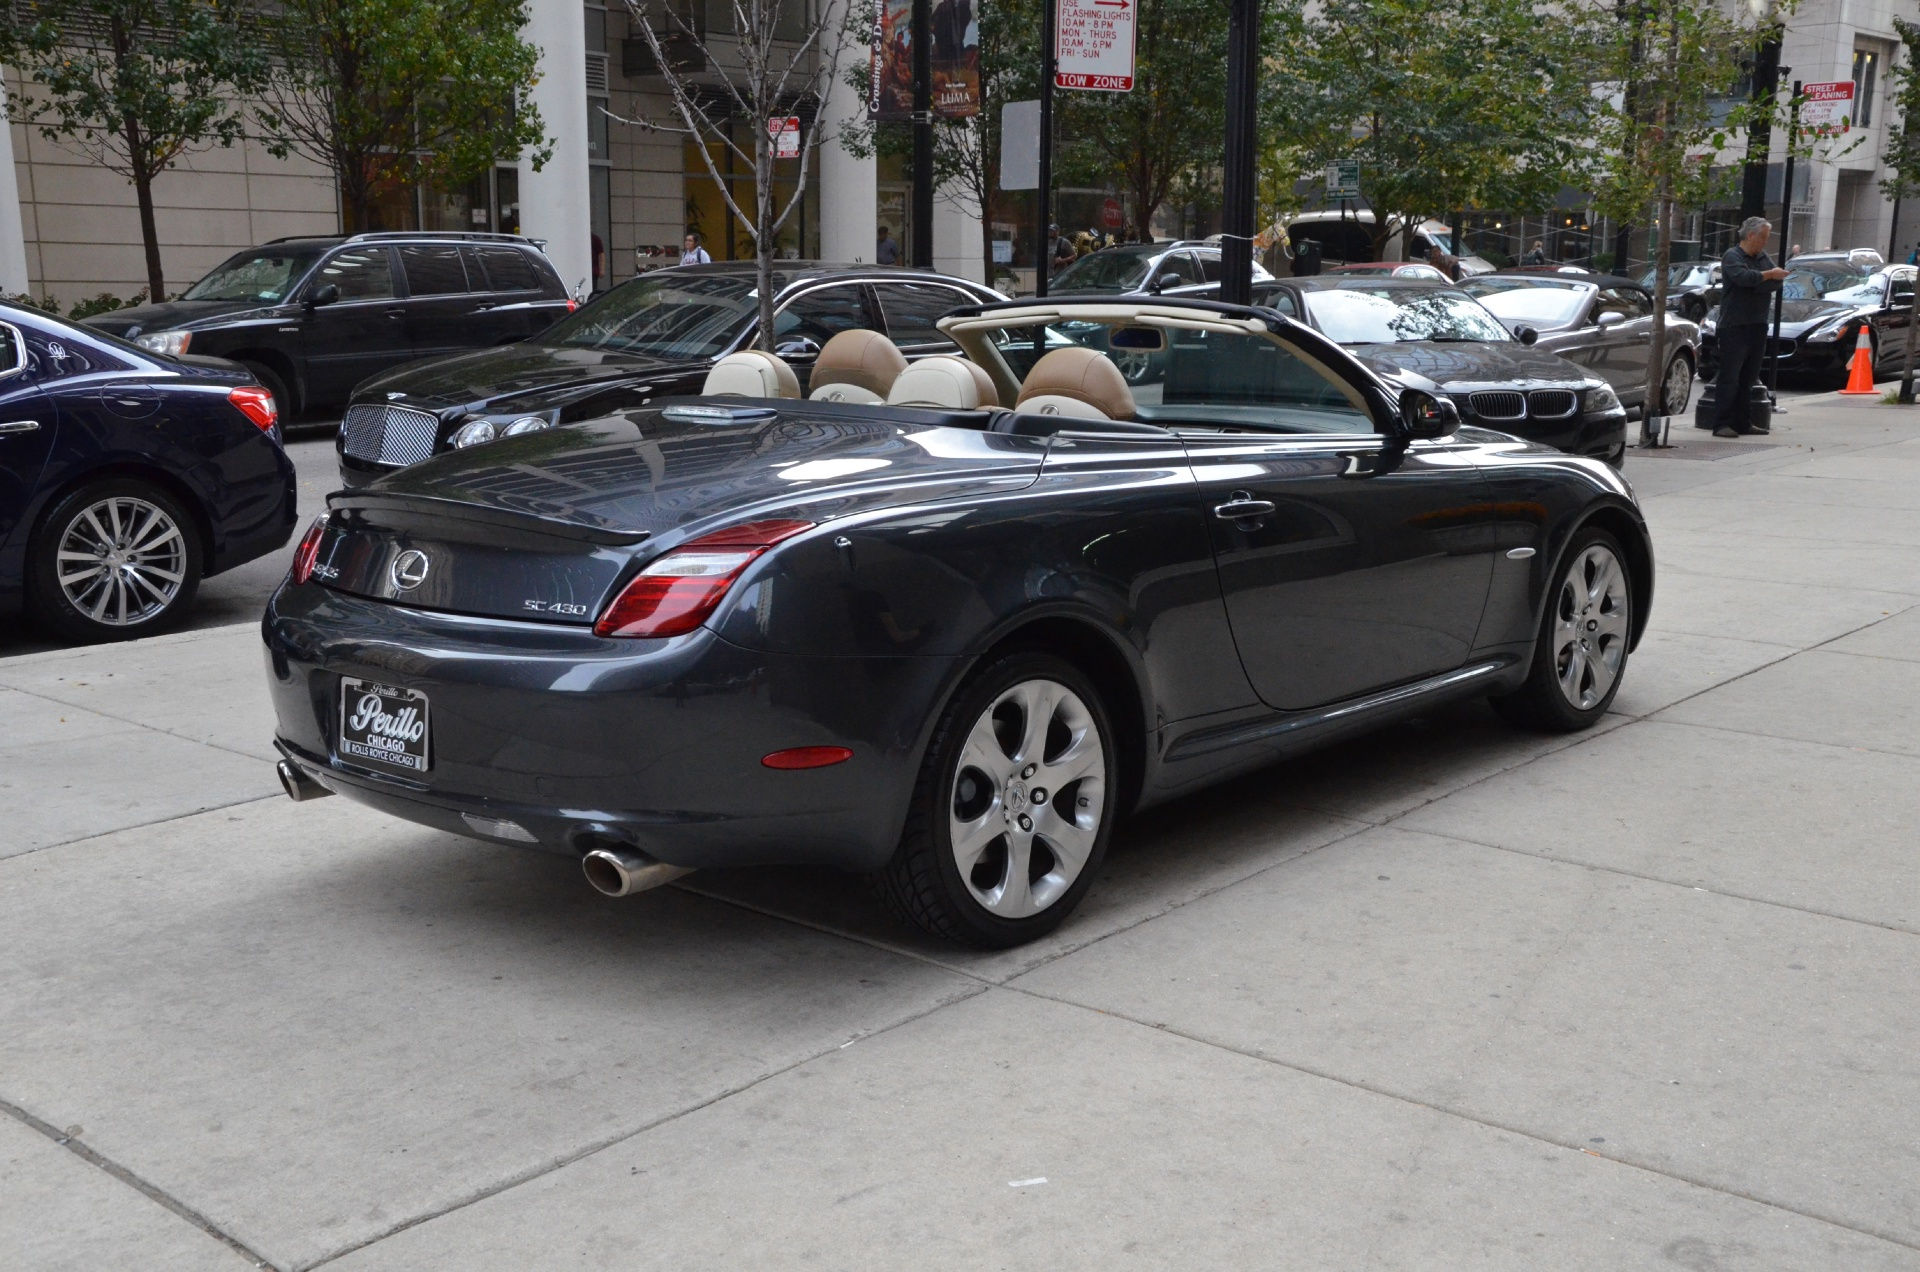 2008 Lexus SC 430 Stock GC1505B for sale near Chicago IL